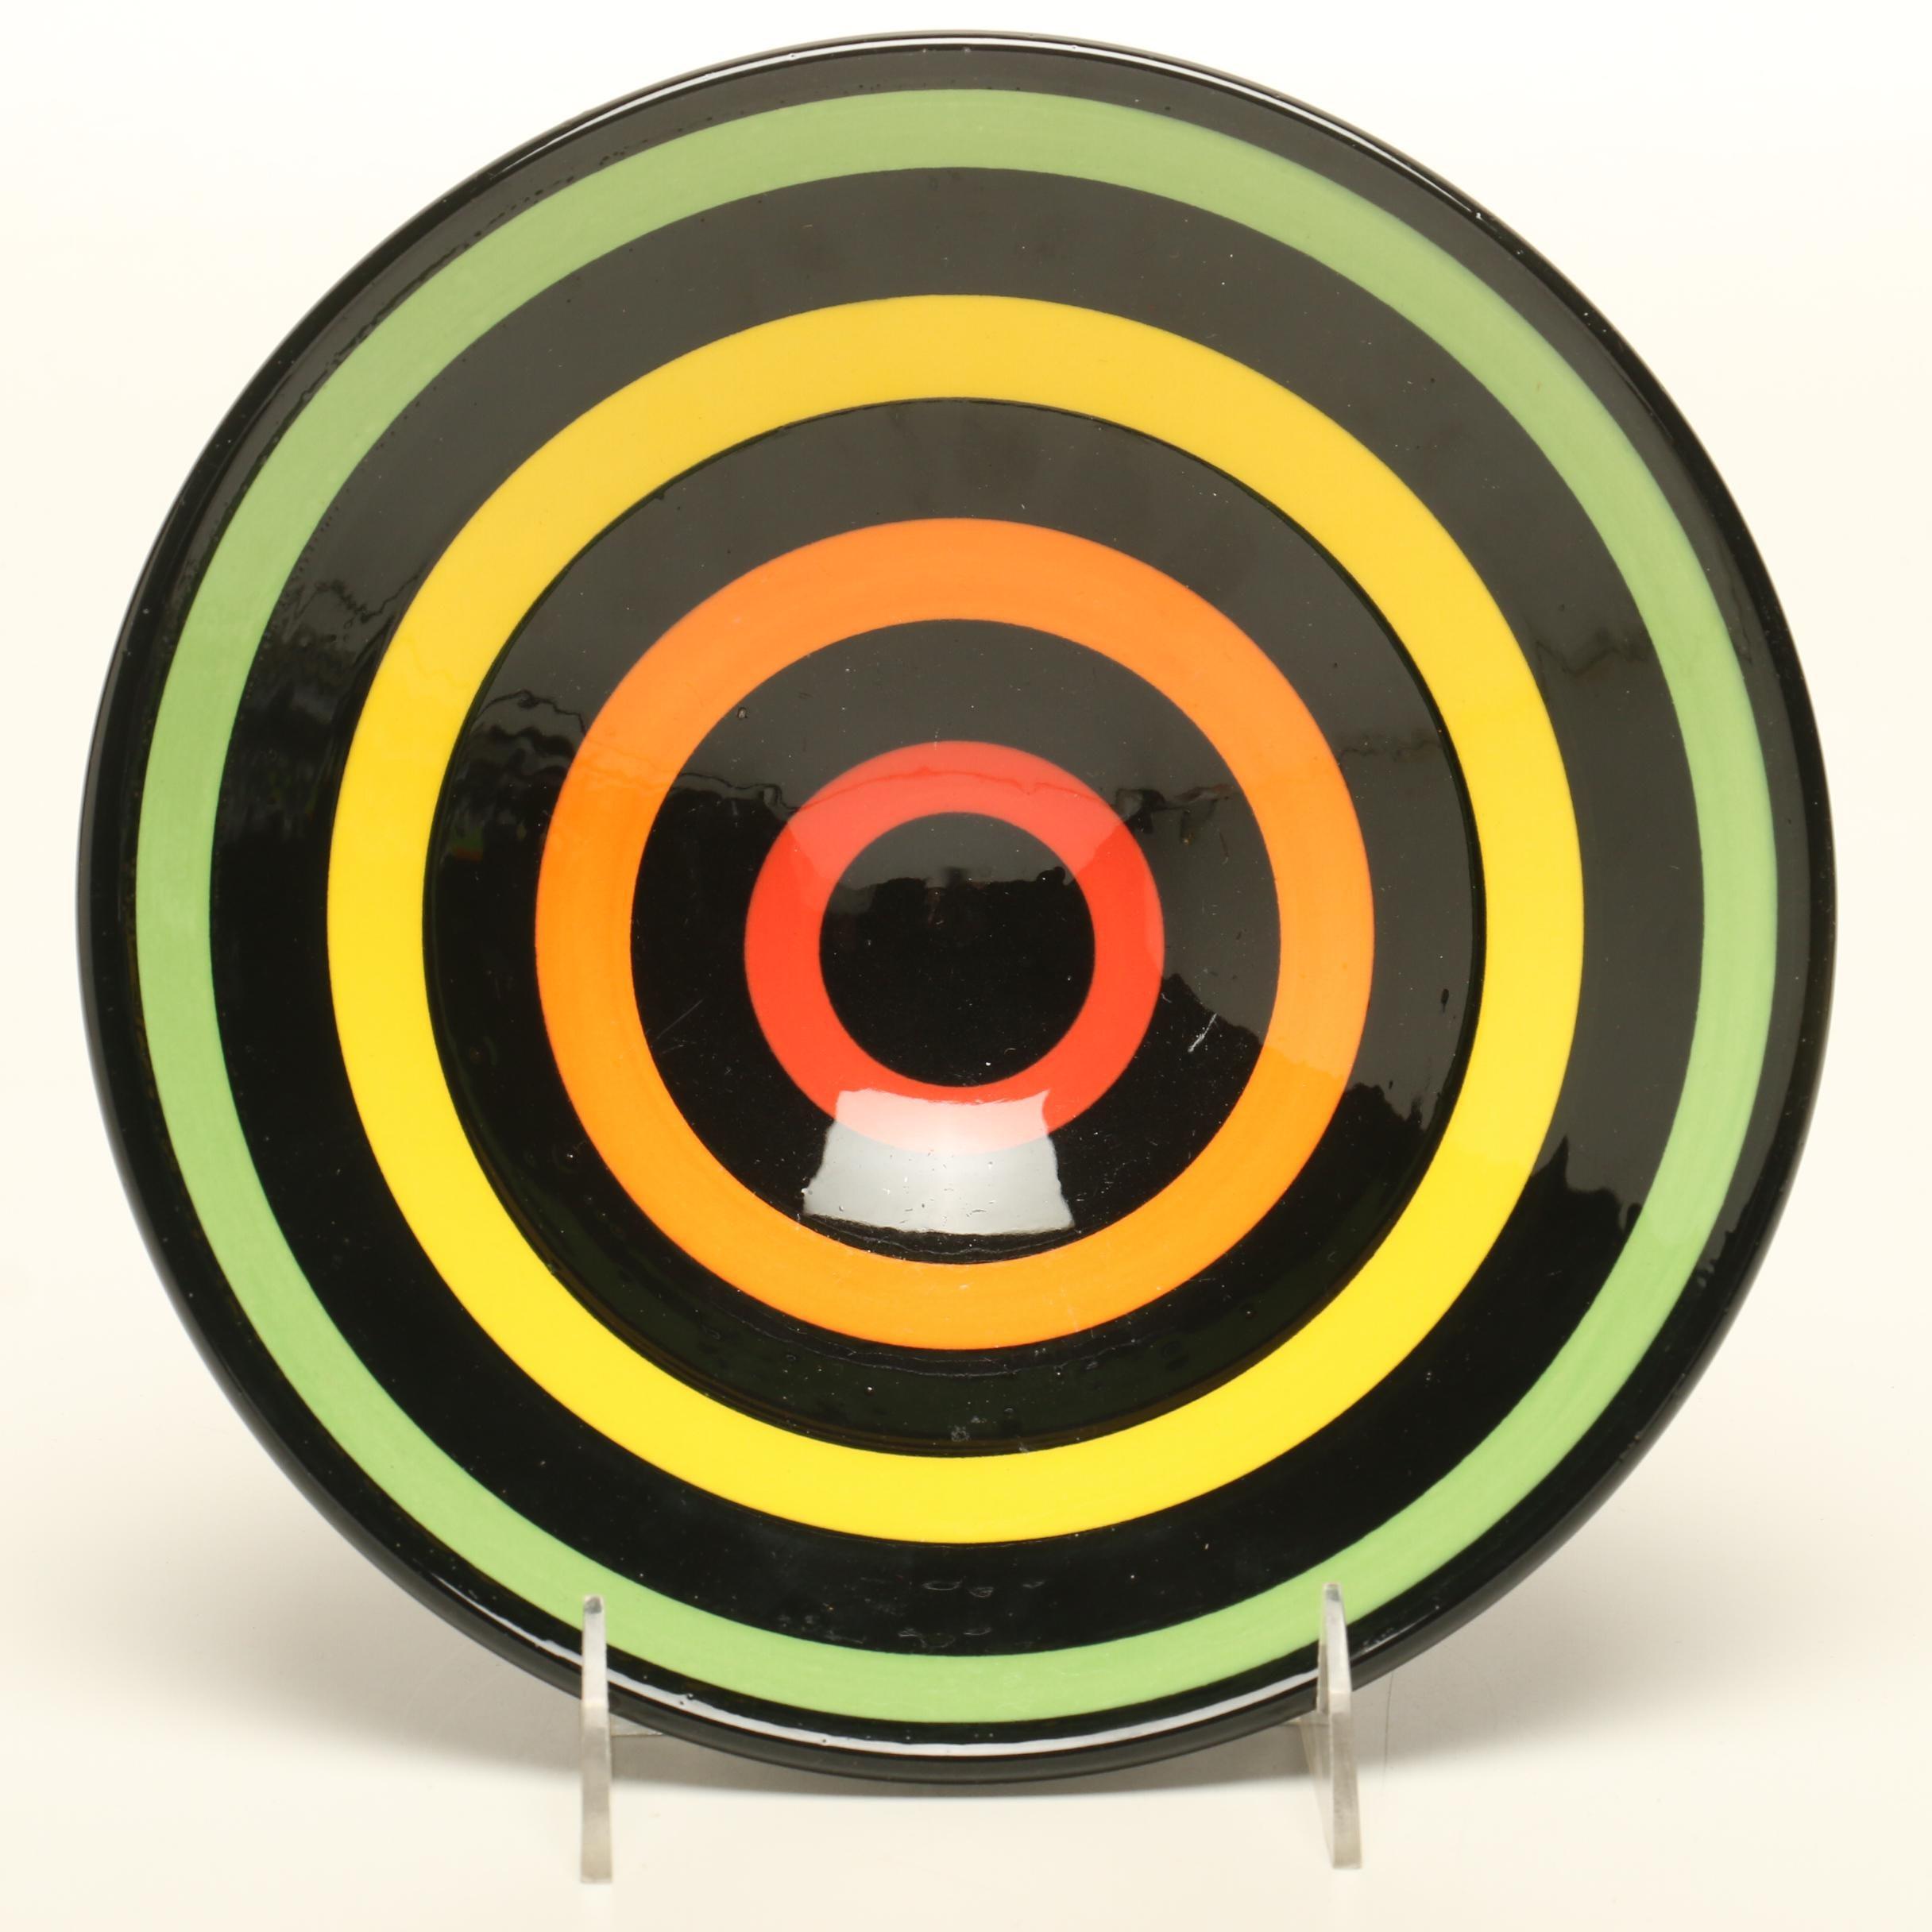 Mid-Century Modern Patrick Dougherty Signed Ceramic Bowl